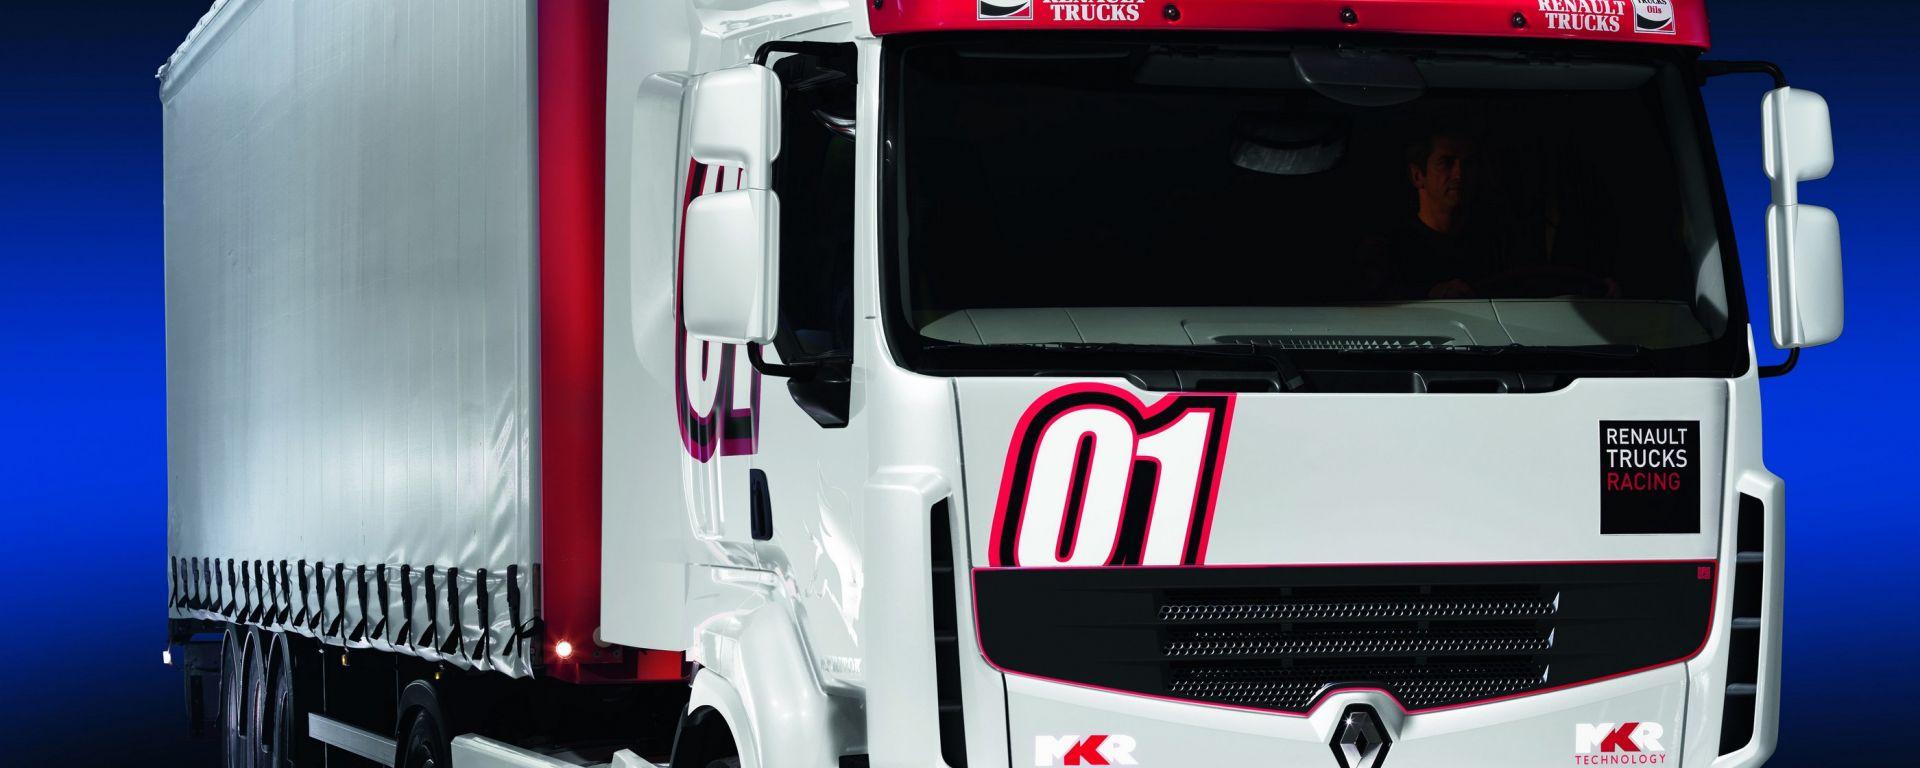 Premium Truck Racing 2013